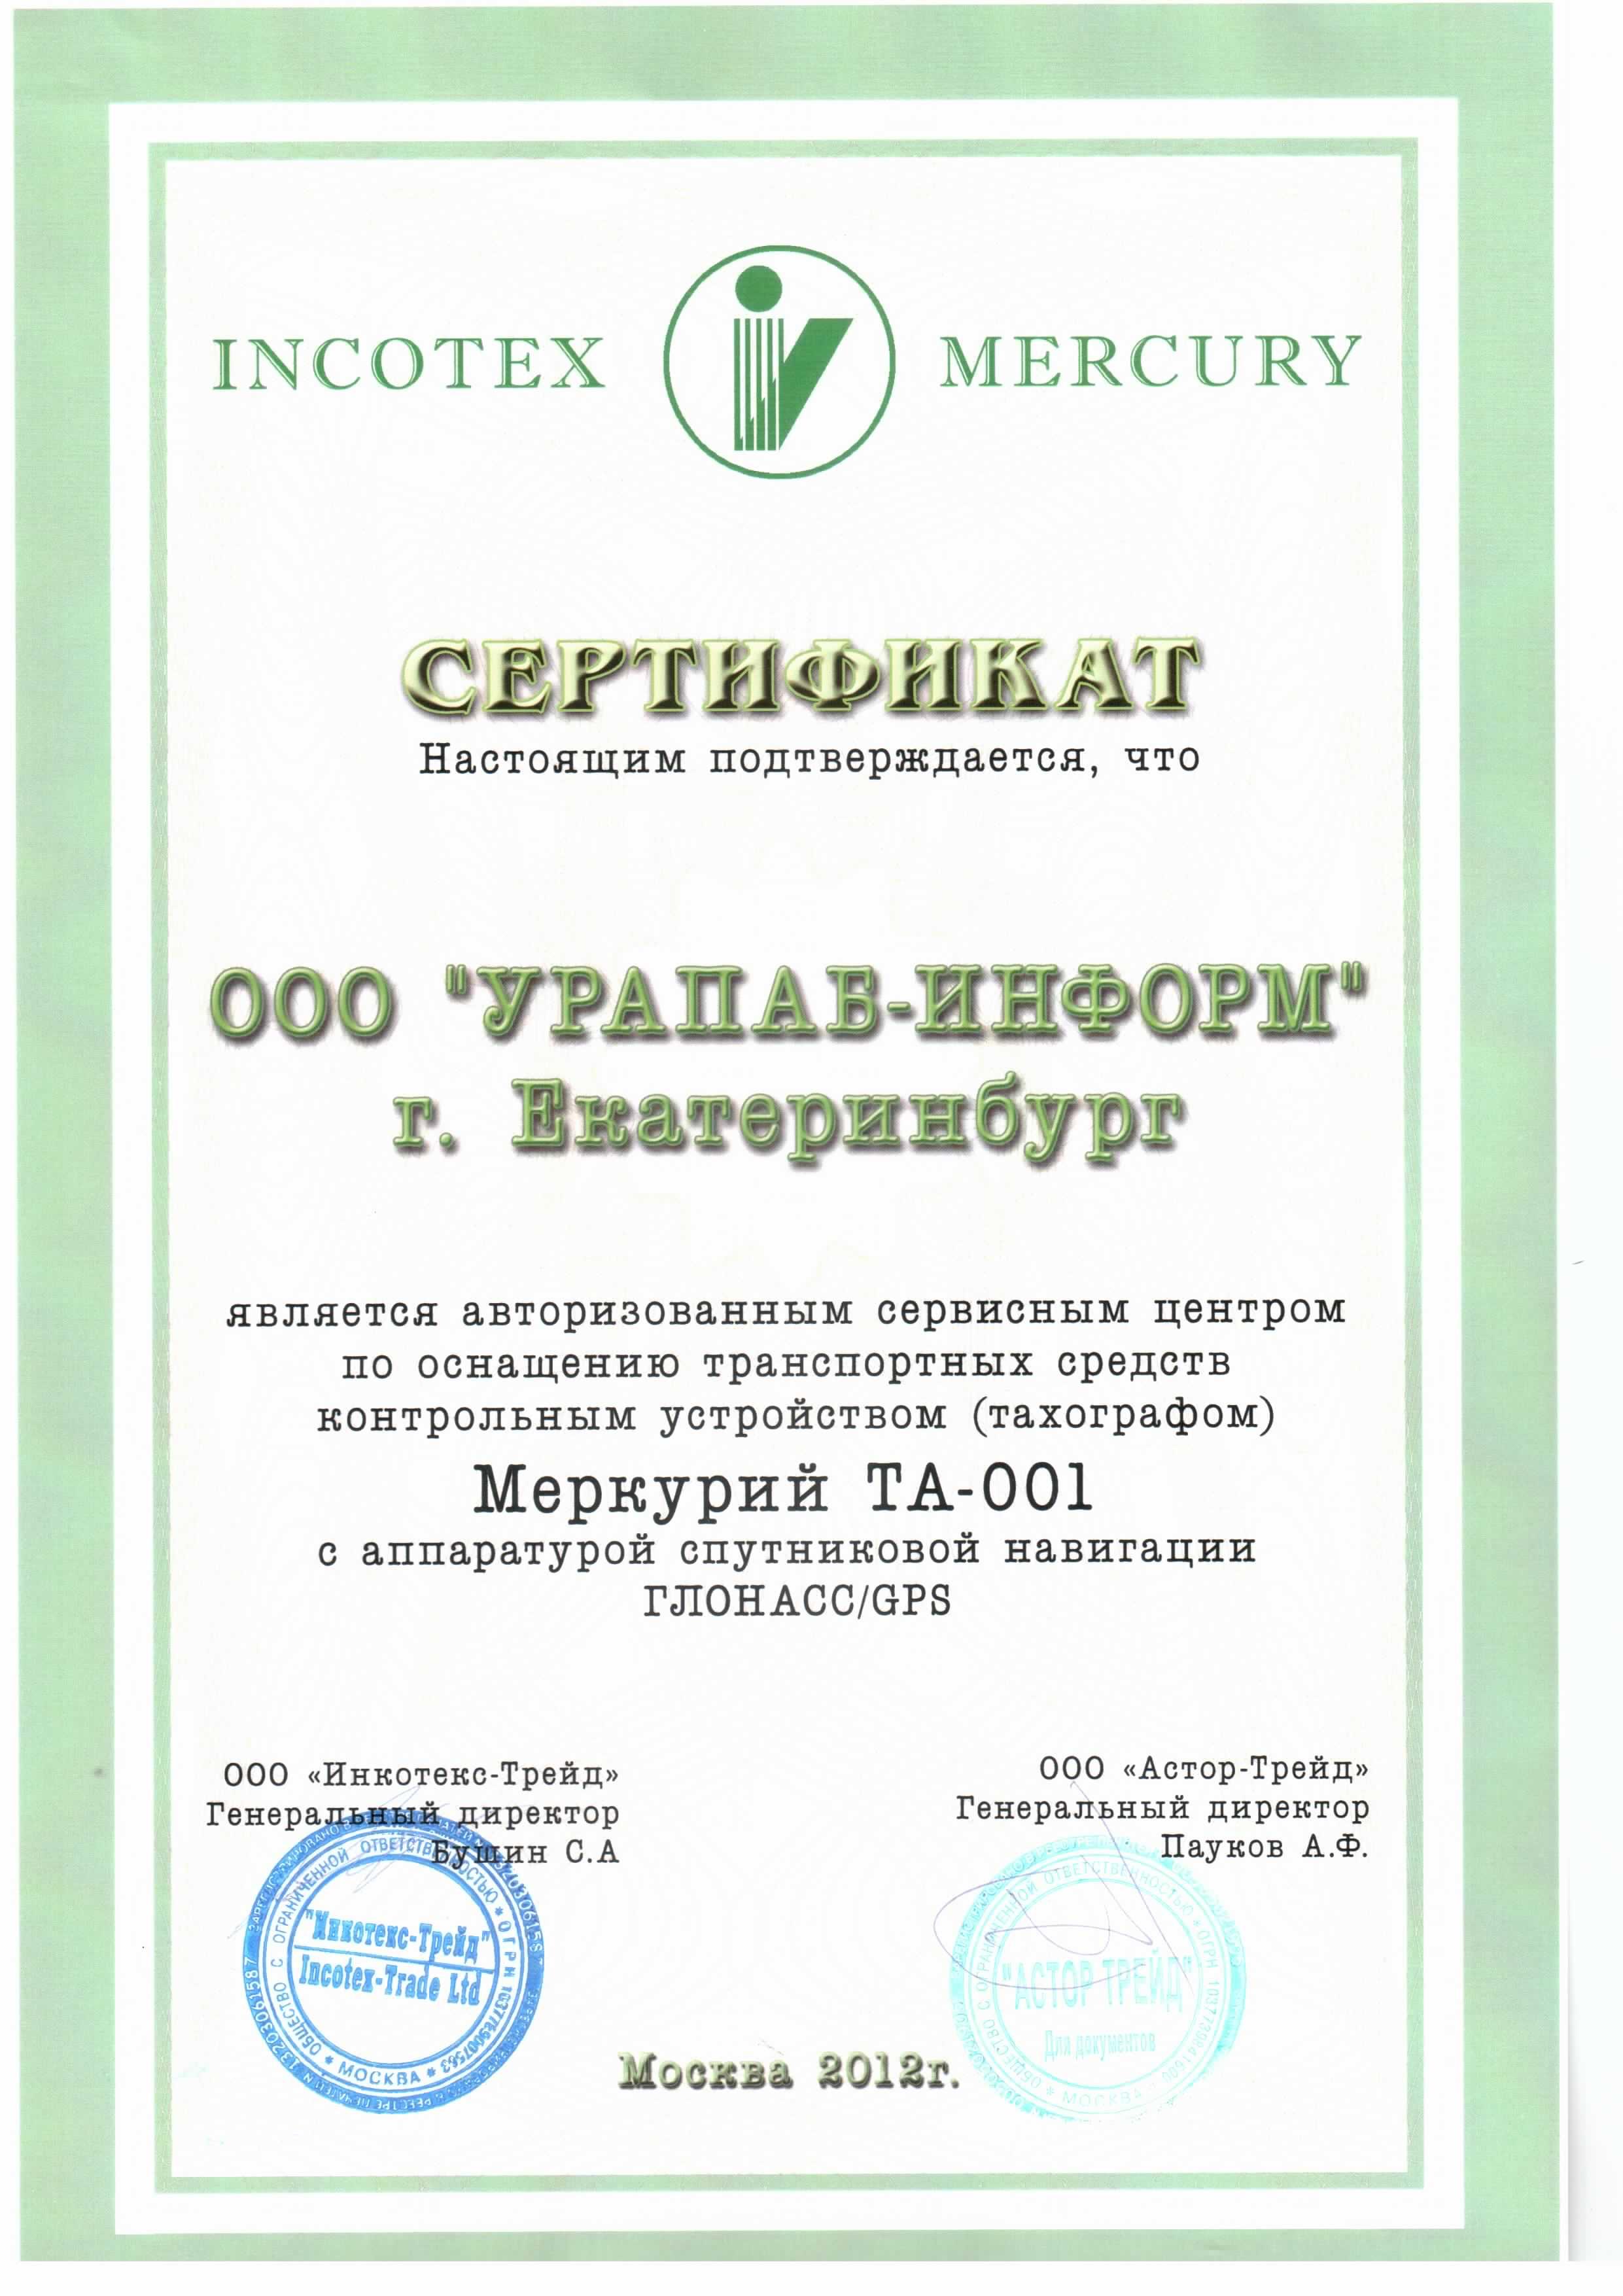 Сервисный центр тахографов меркурий